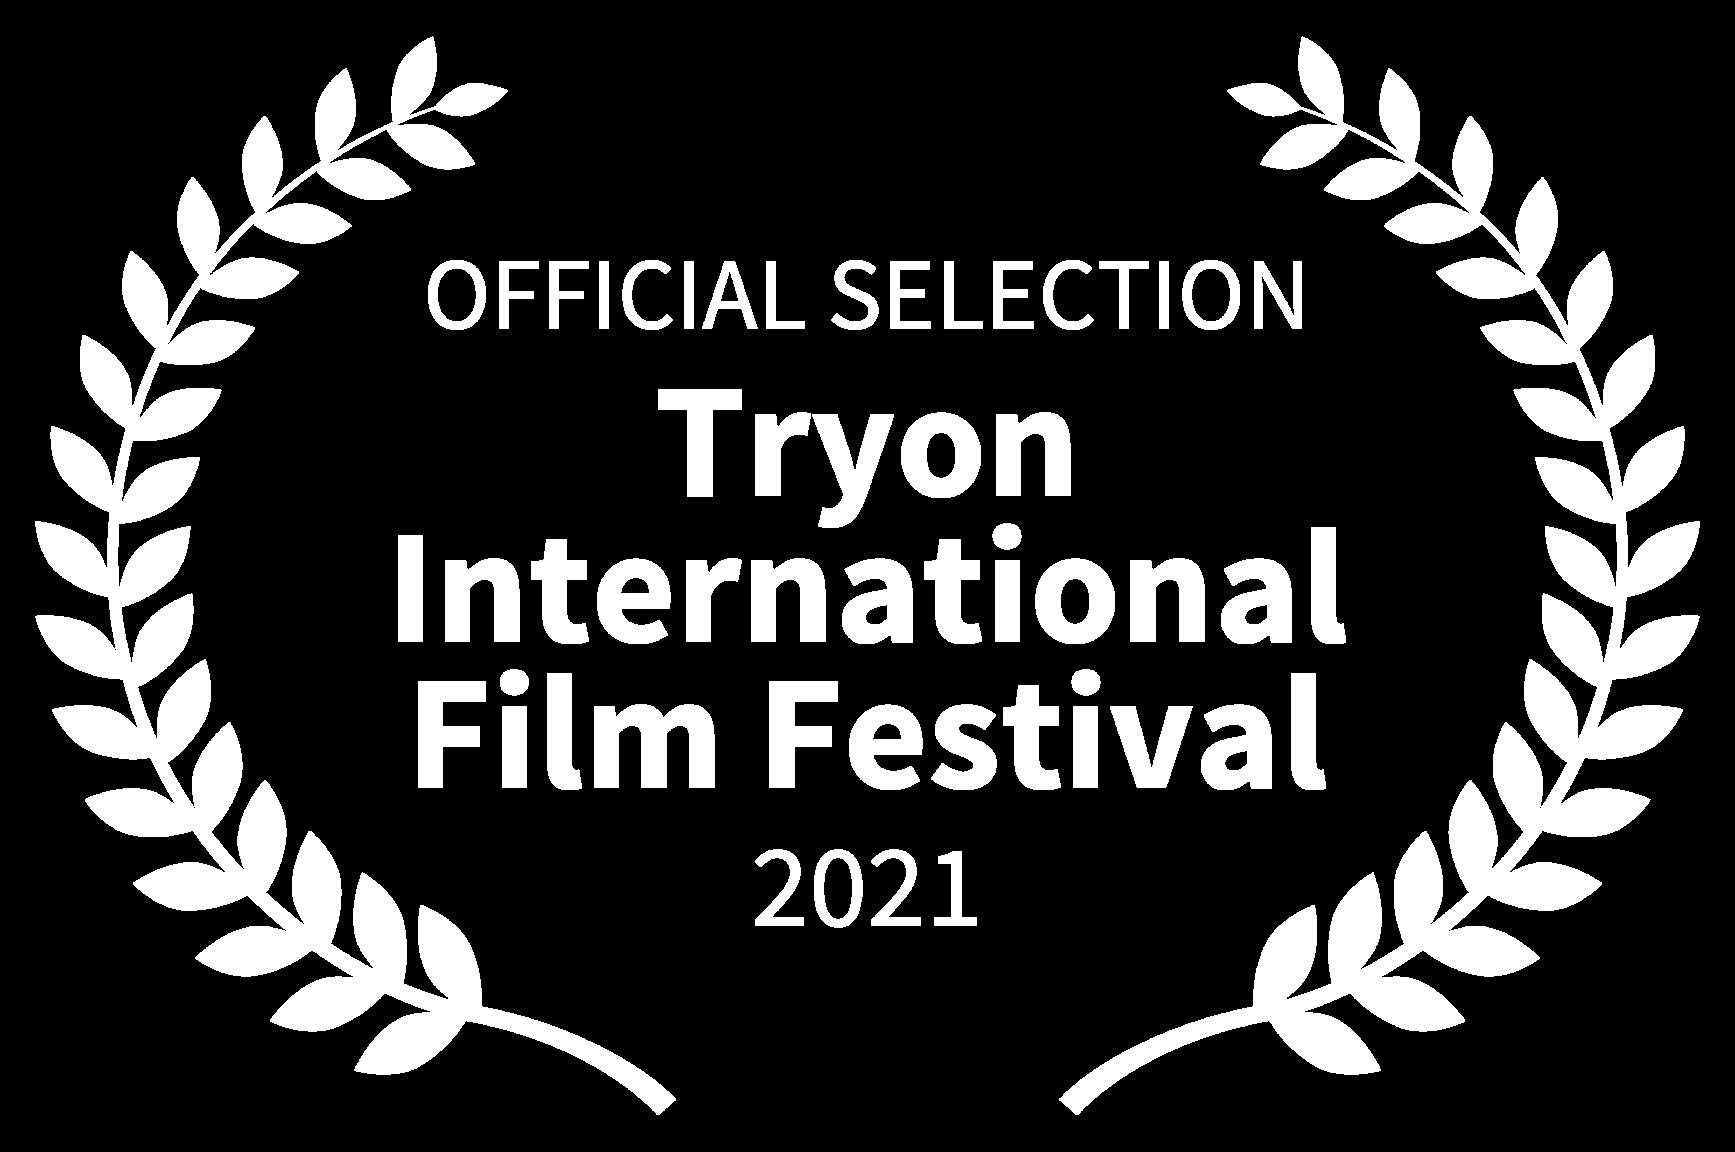 /tryon International Film